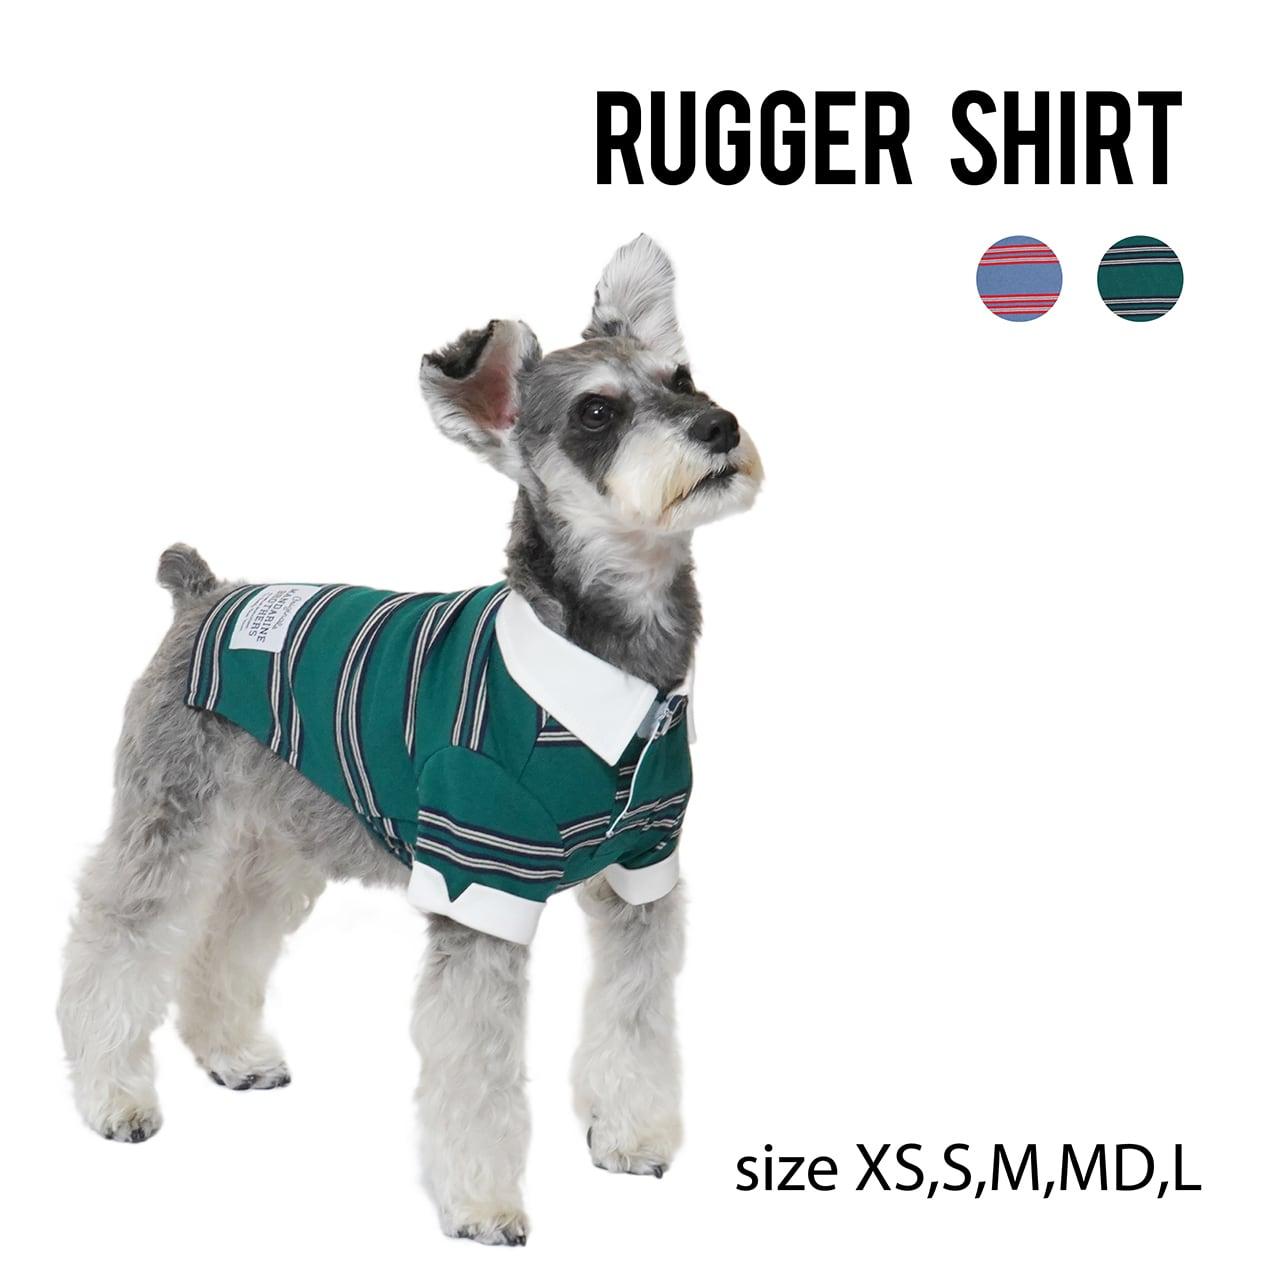 RUGGER SHIRT(XS,S,M,MD,L) ラガーシャツ